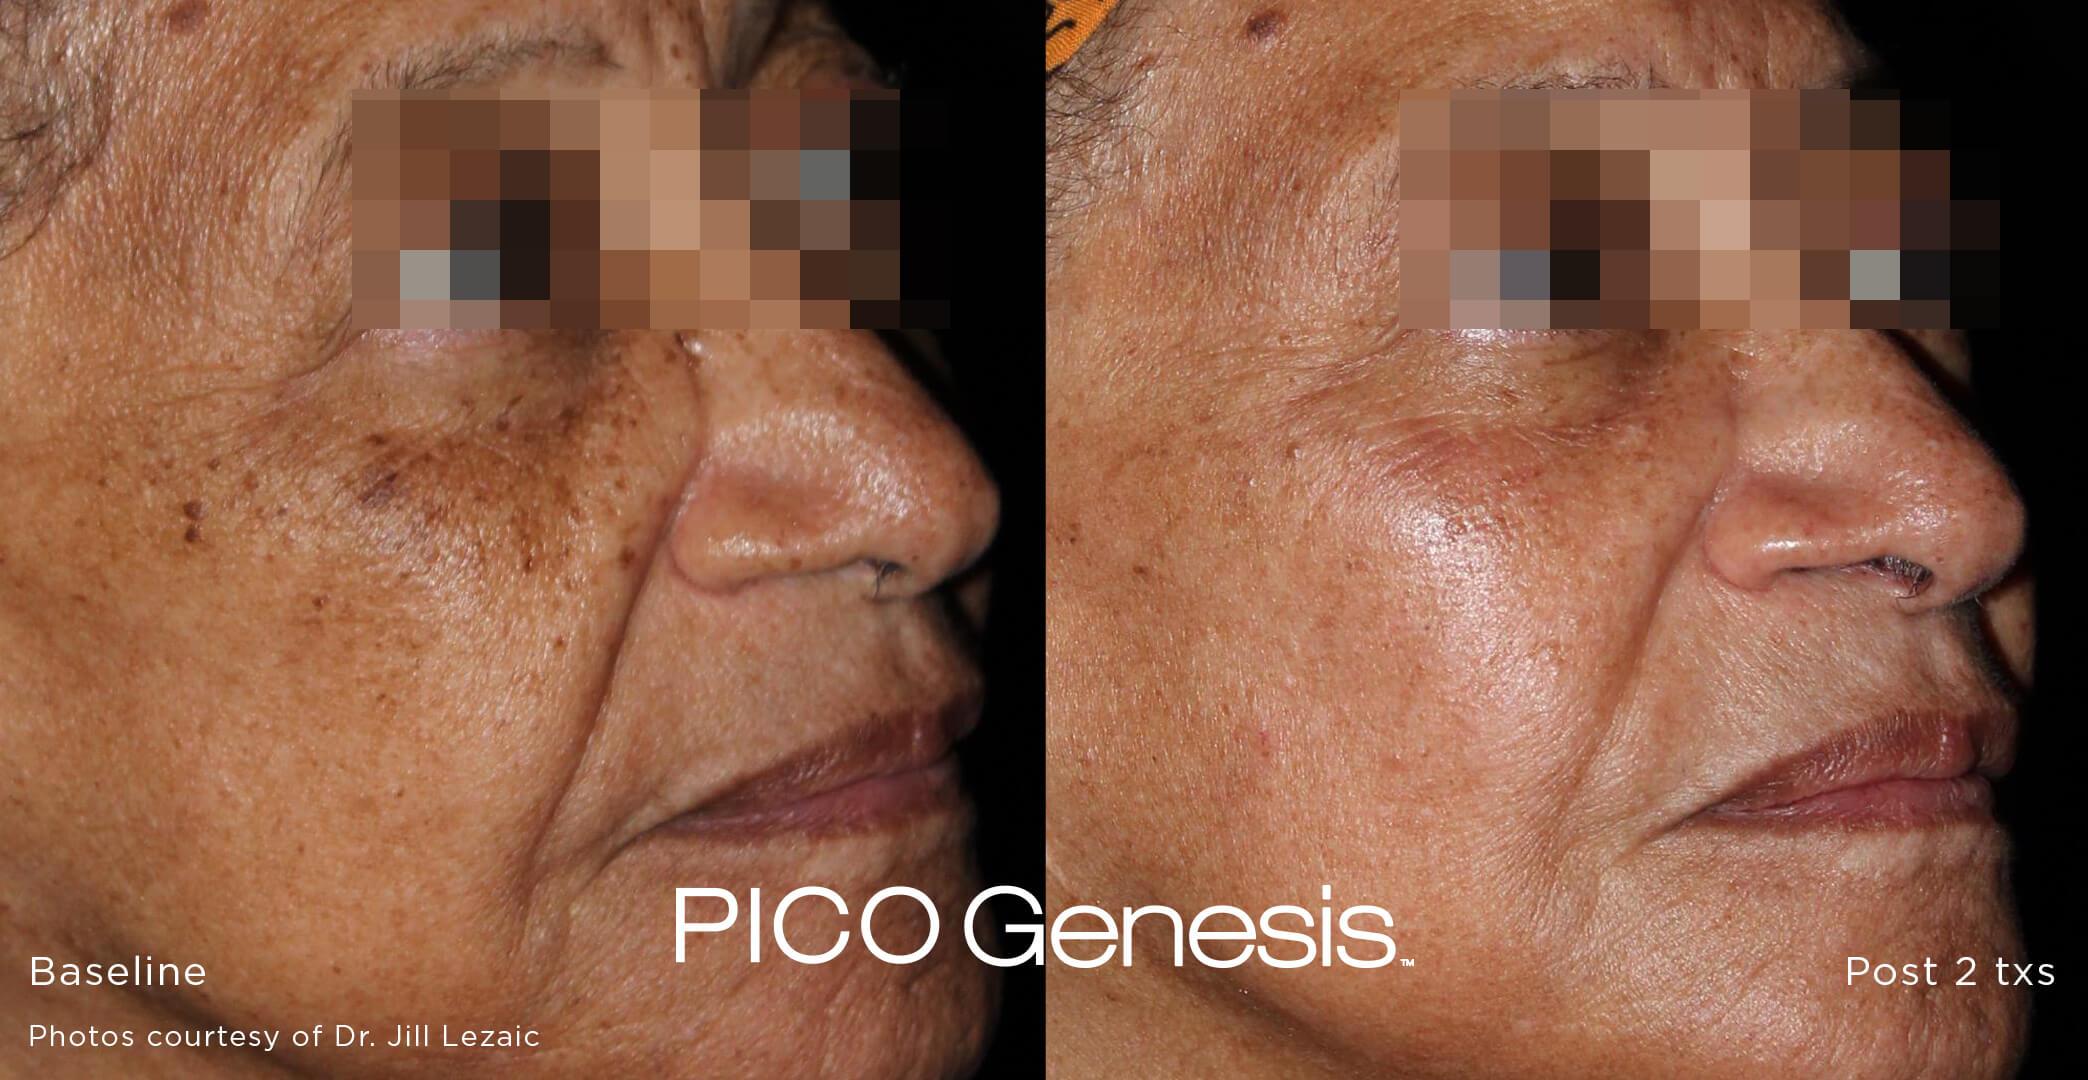 PicoGenesis sunspots